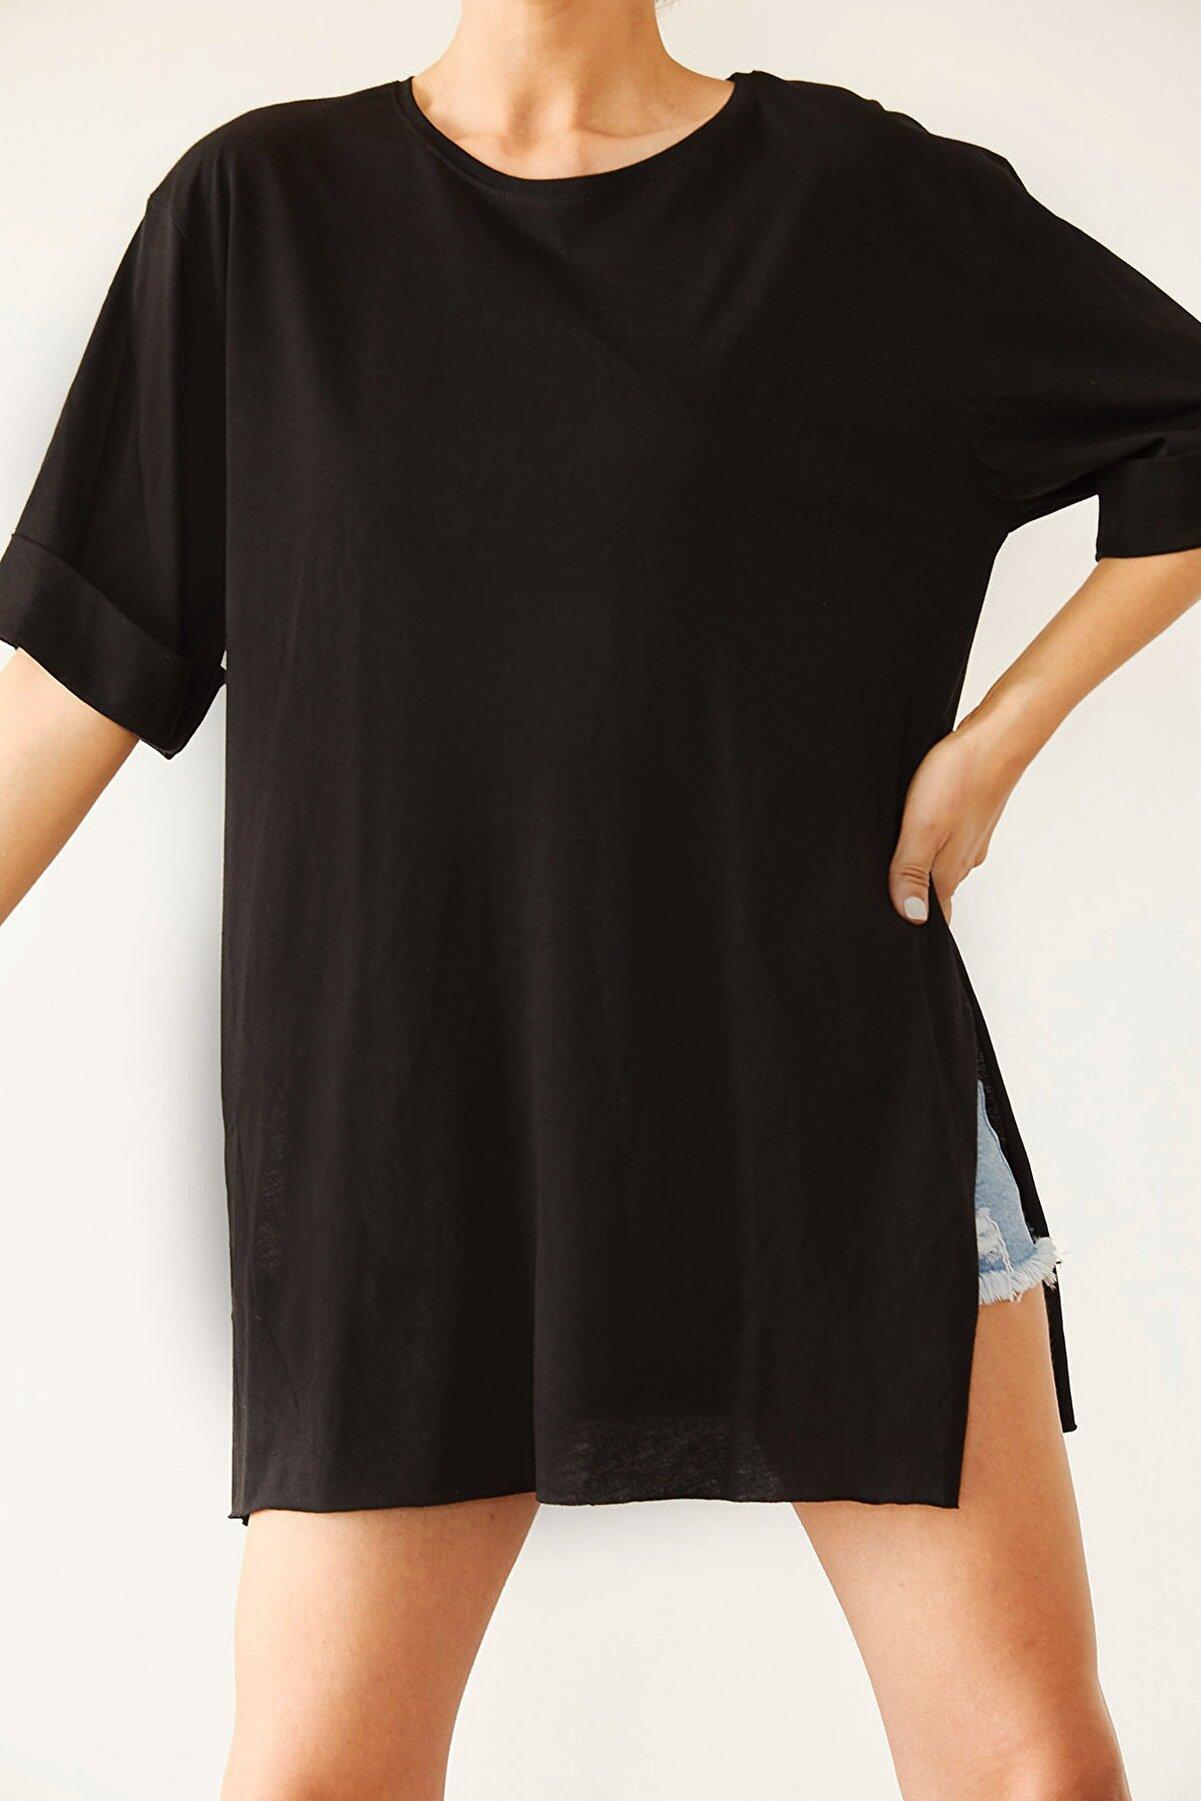 Xena Kadın Siyah Boyfriend Basic Tişört 0YZK1-10343